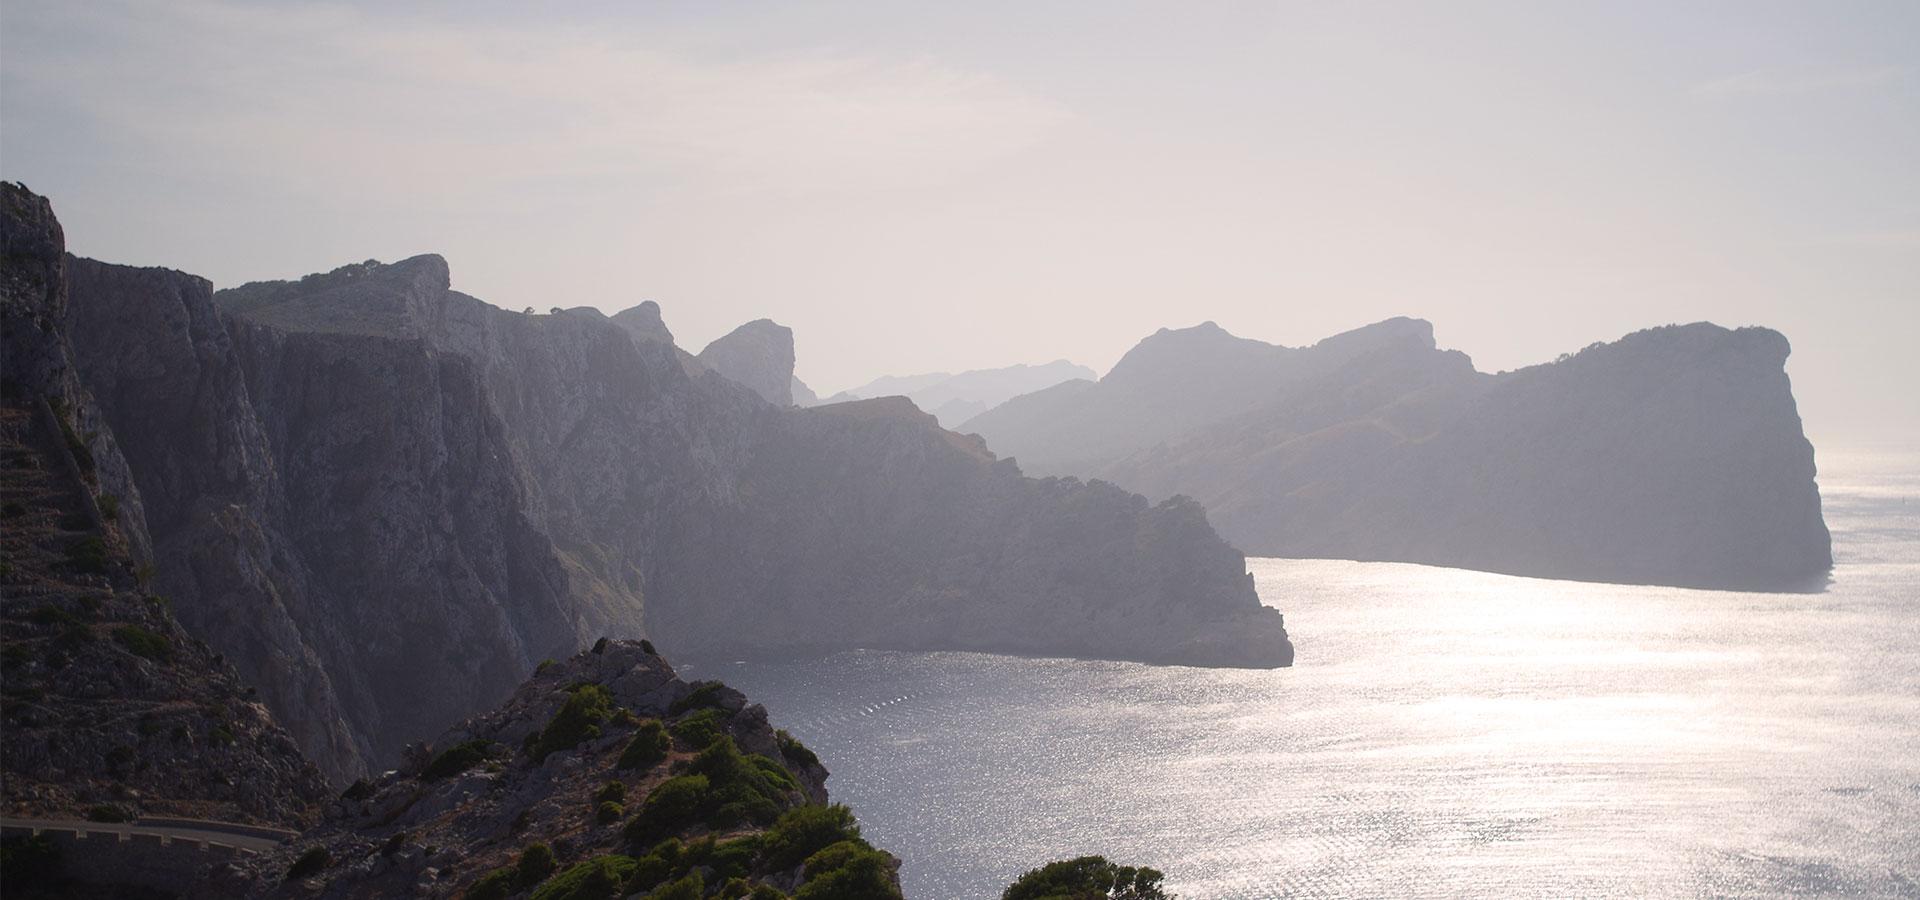 Sonnenuntergang Küste Mallorca Cap Formentor